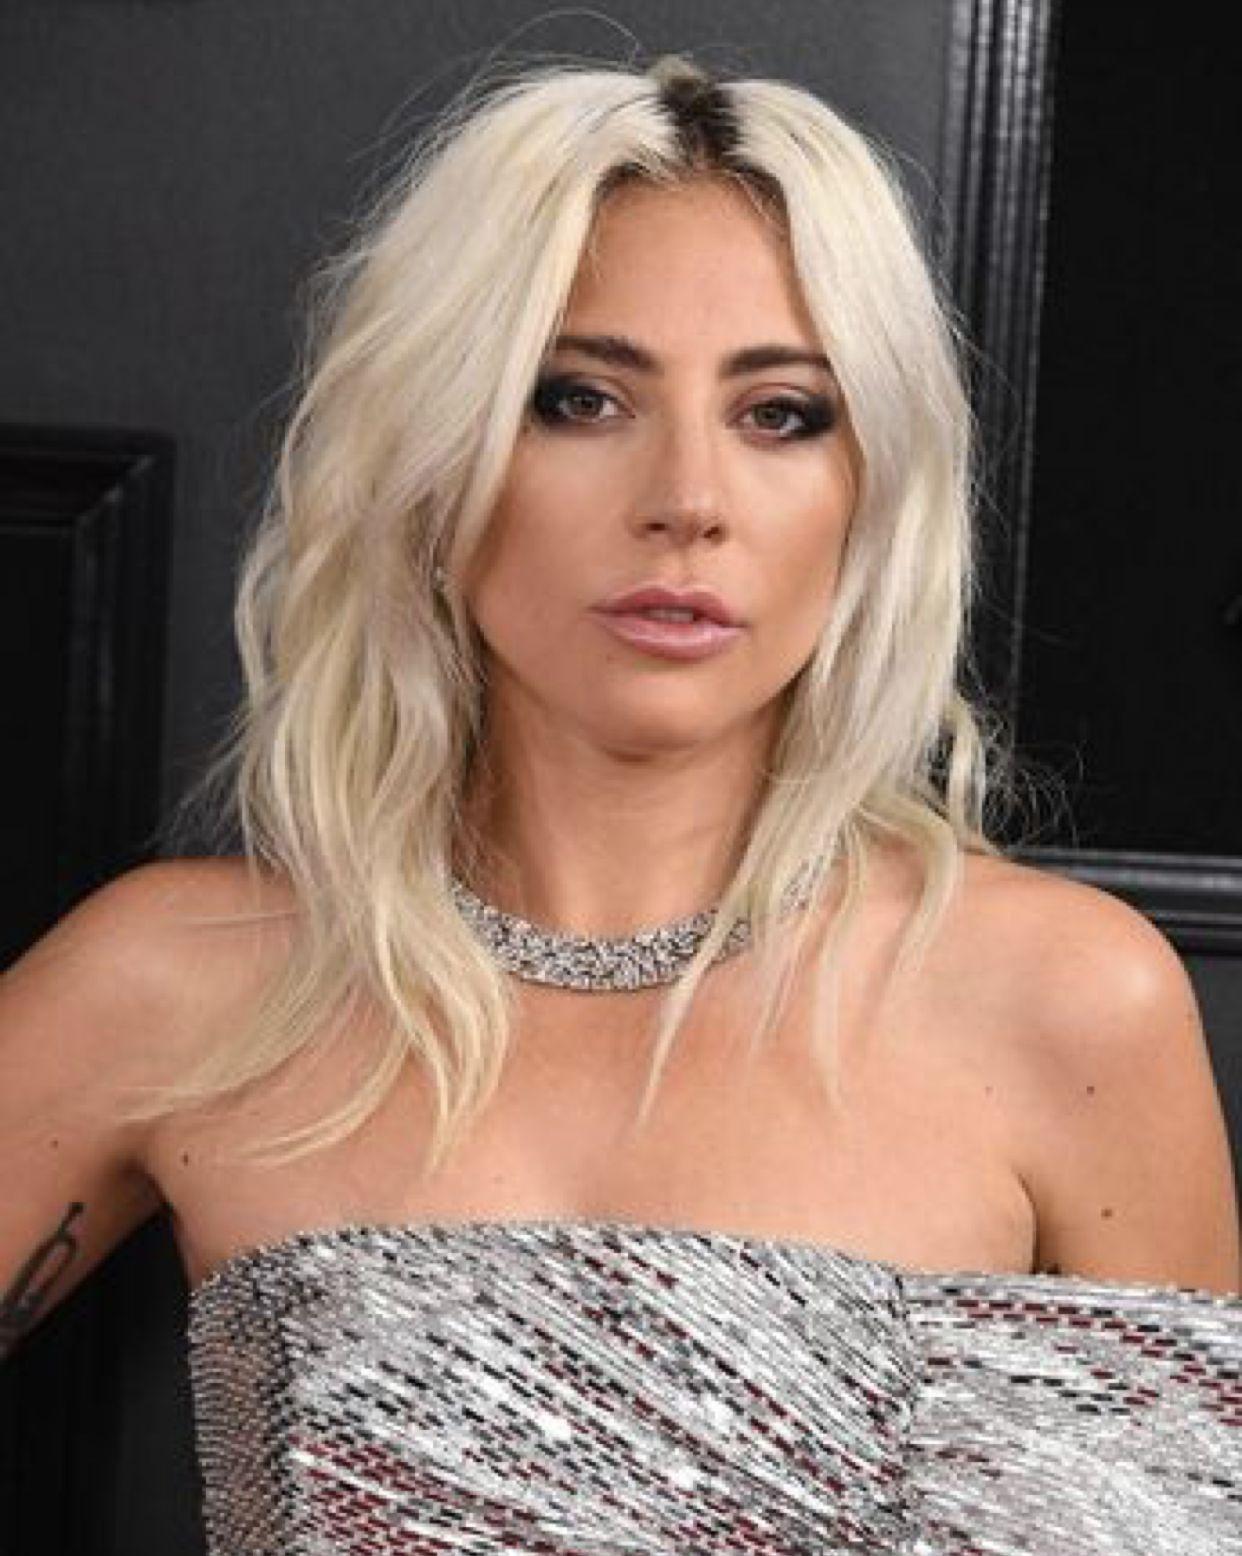 Angel Lady Gaga Lady Gaga Hair Platinum Blonde Hair Lady Gaga Pictures